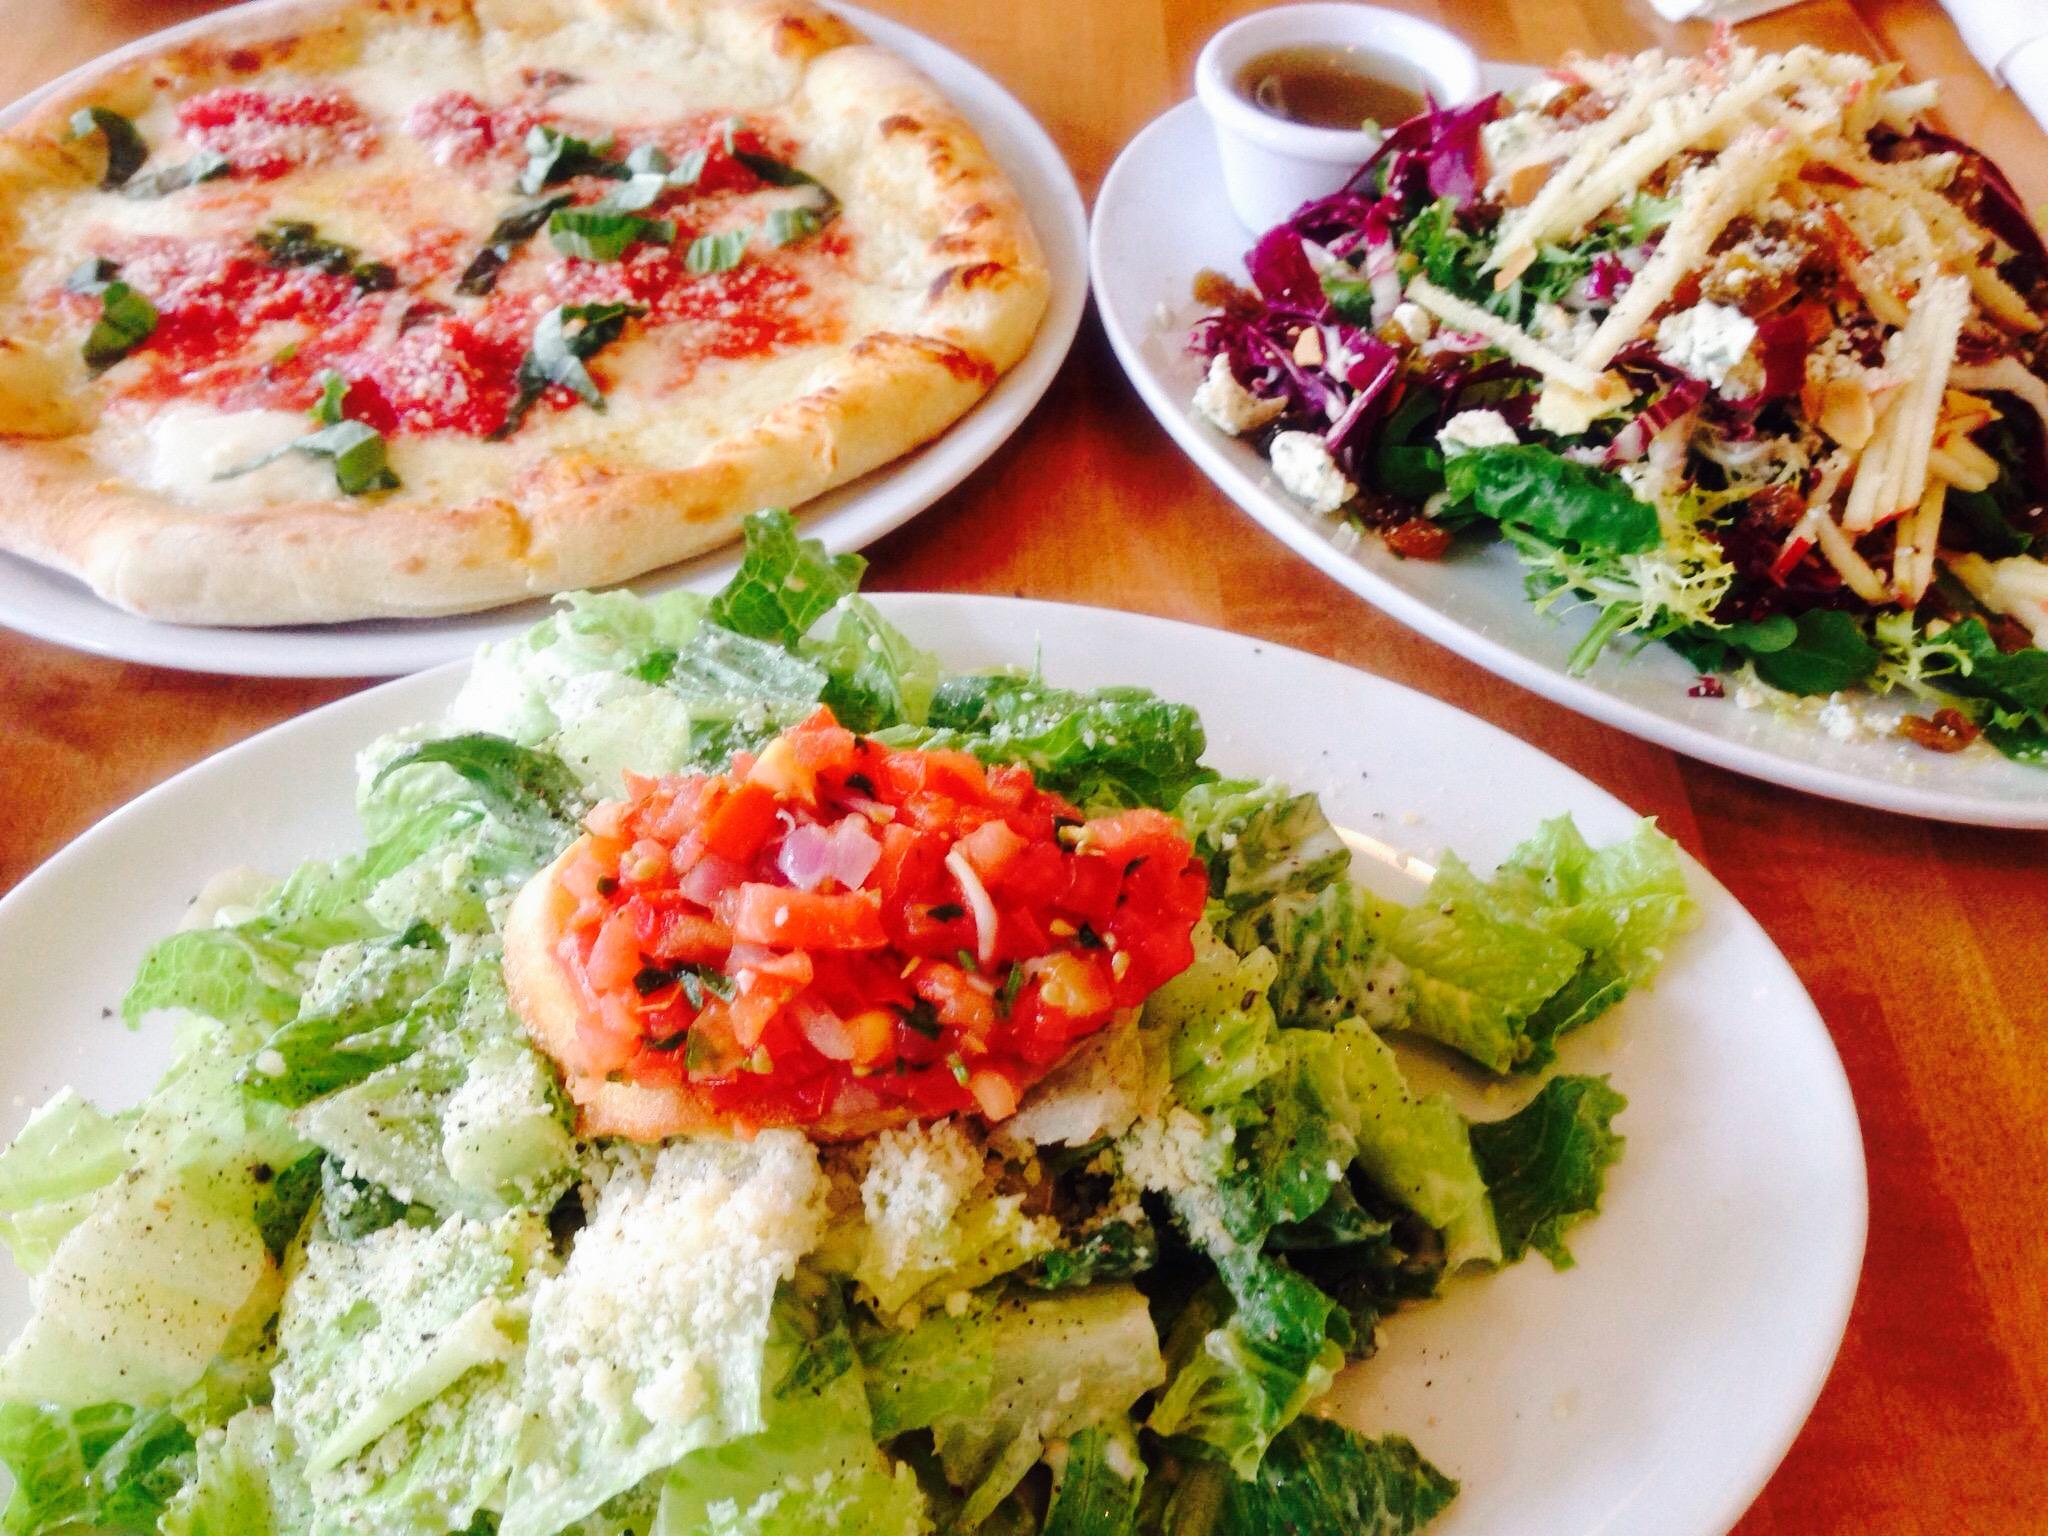 Lake Buena Vista Food Guide: Best